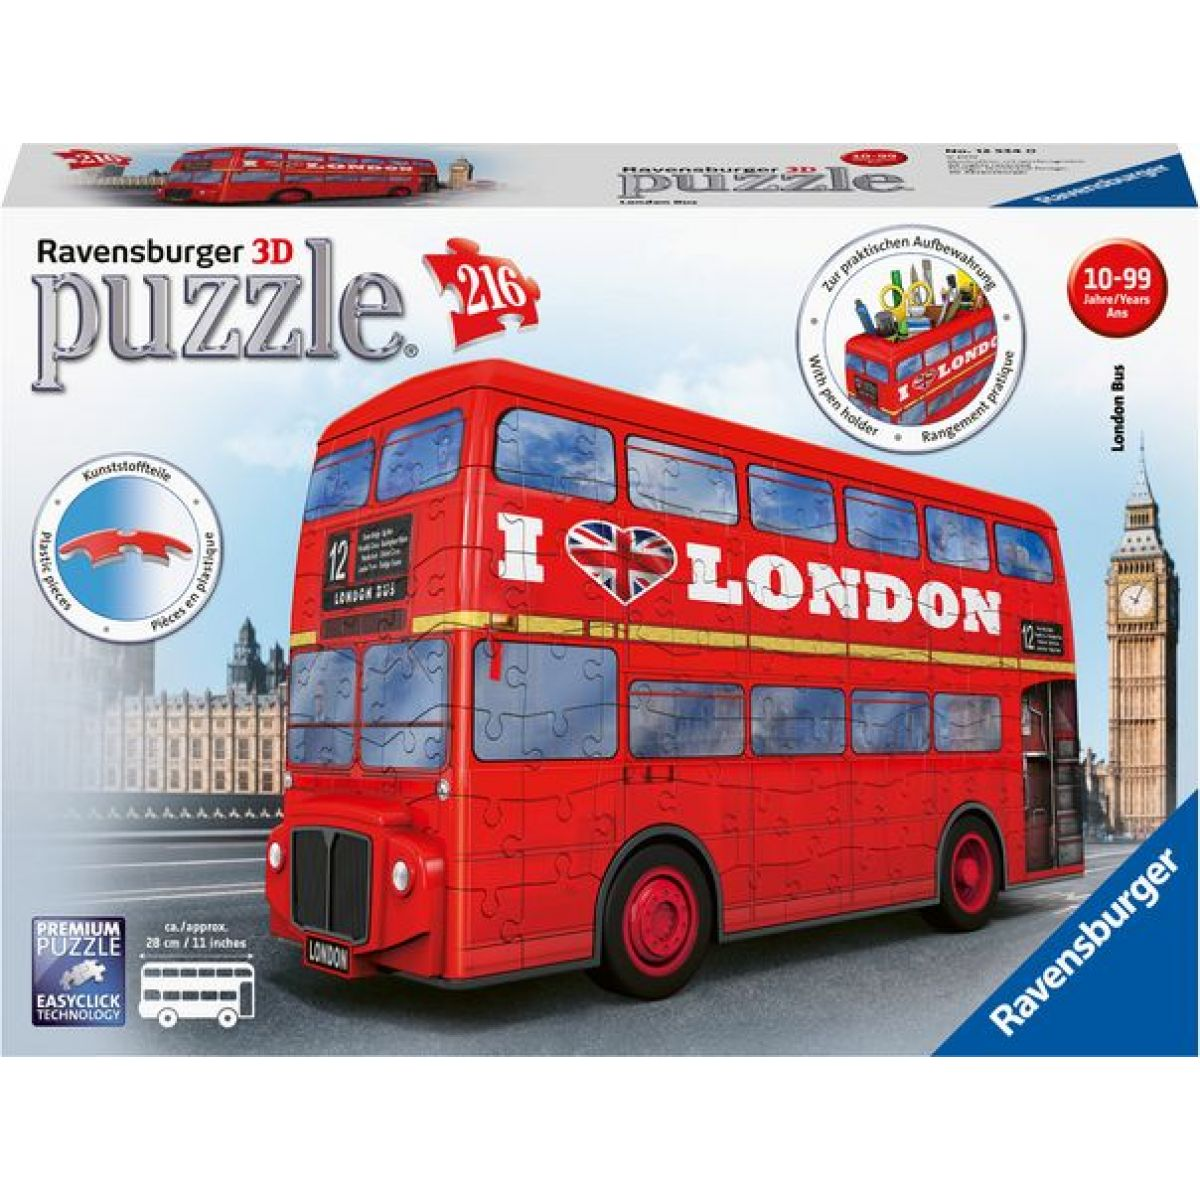 Ravensburger 3D puzzle 125340 Londýnsky autobus 216 dielikov